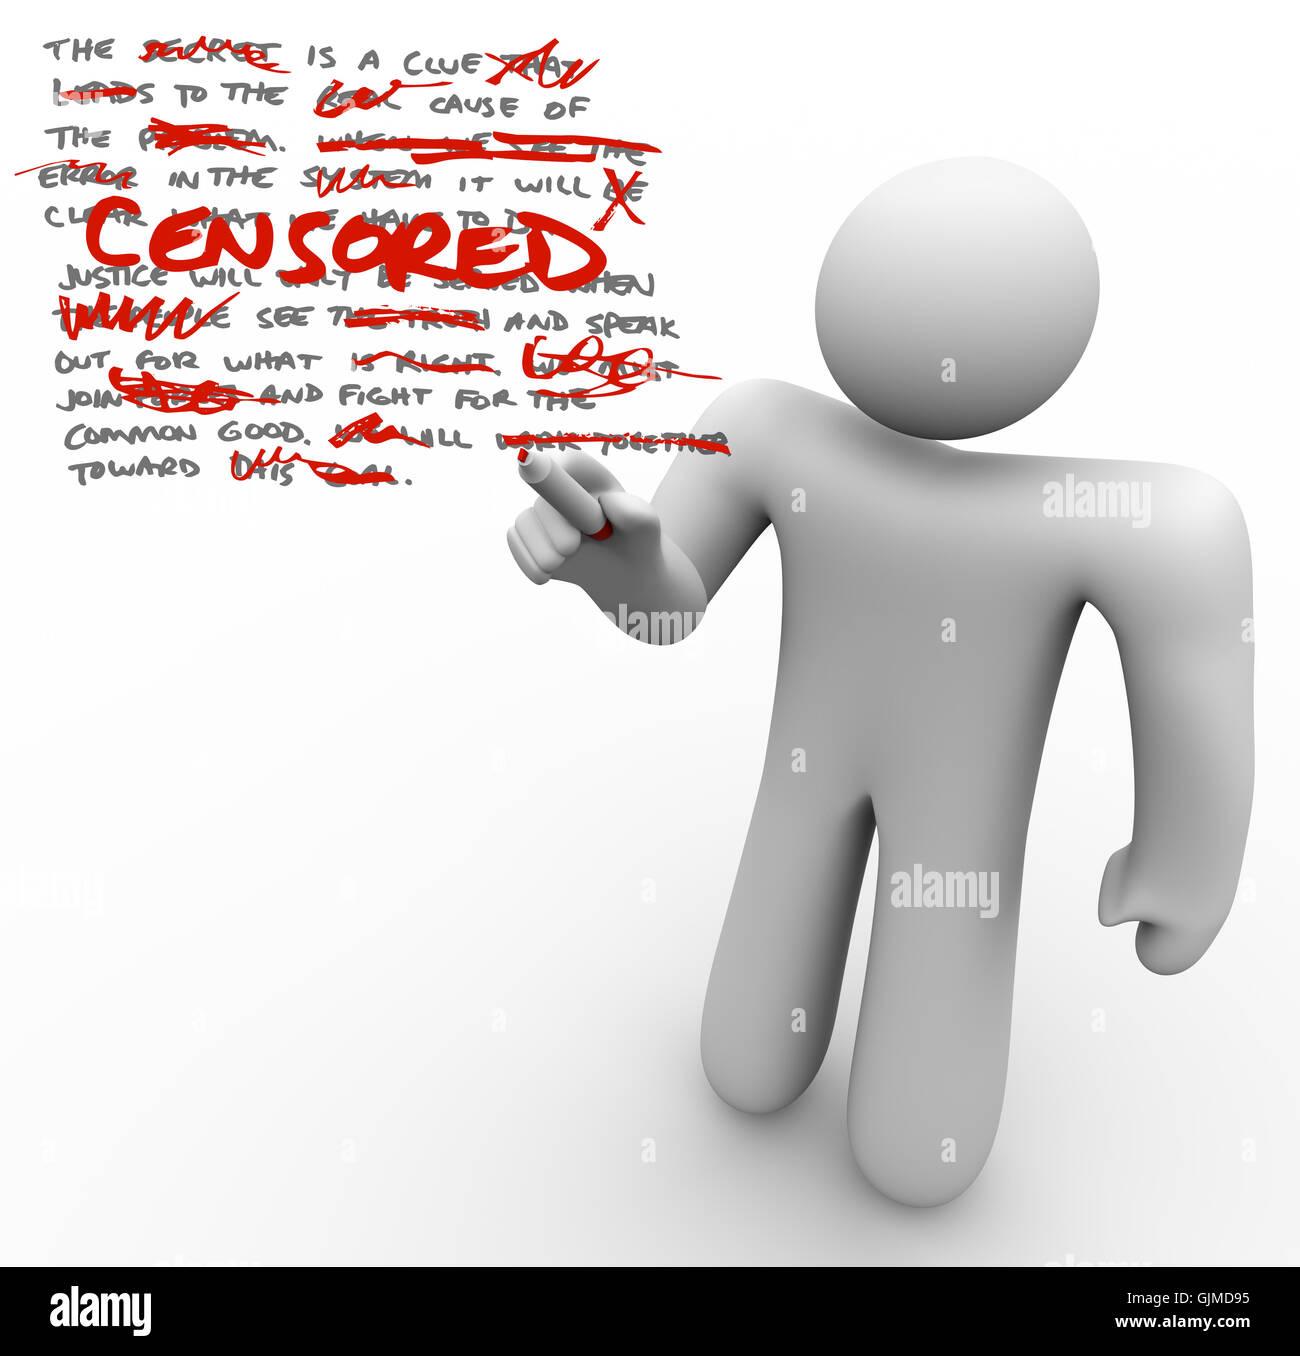 Censored - Man Edits Text Censoring Freedom of Speech - Stock Image